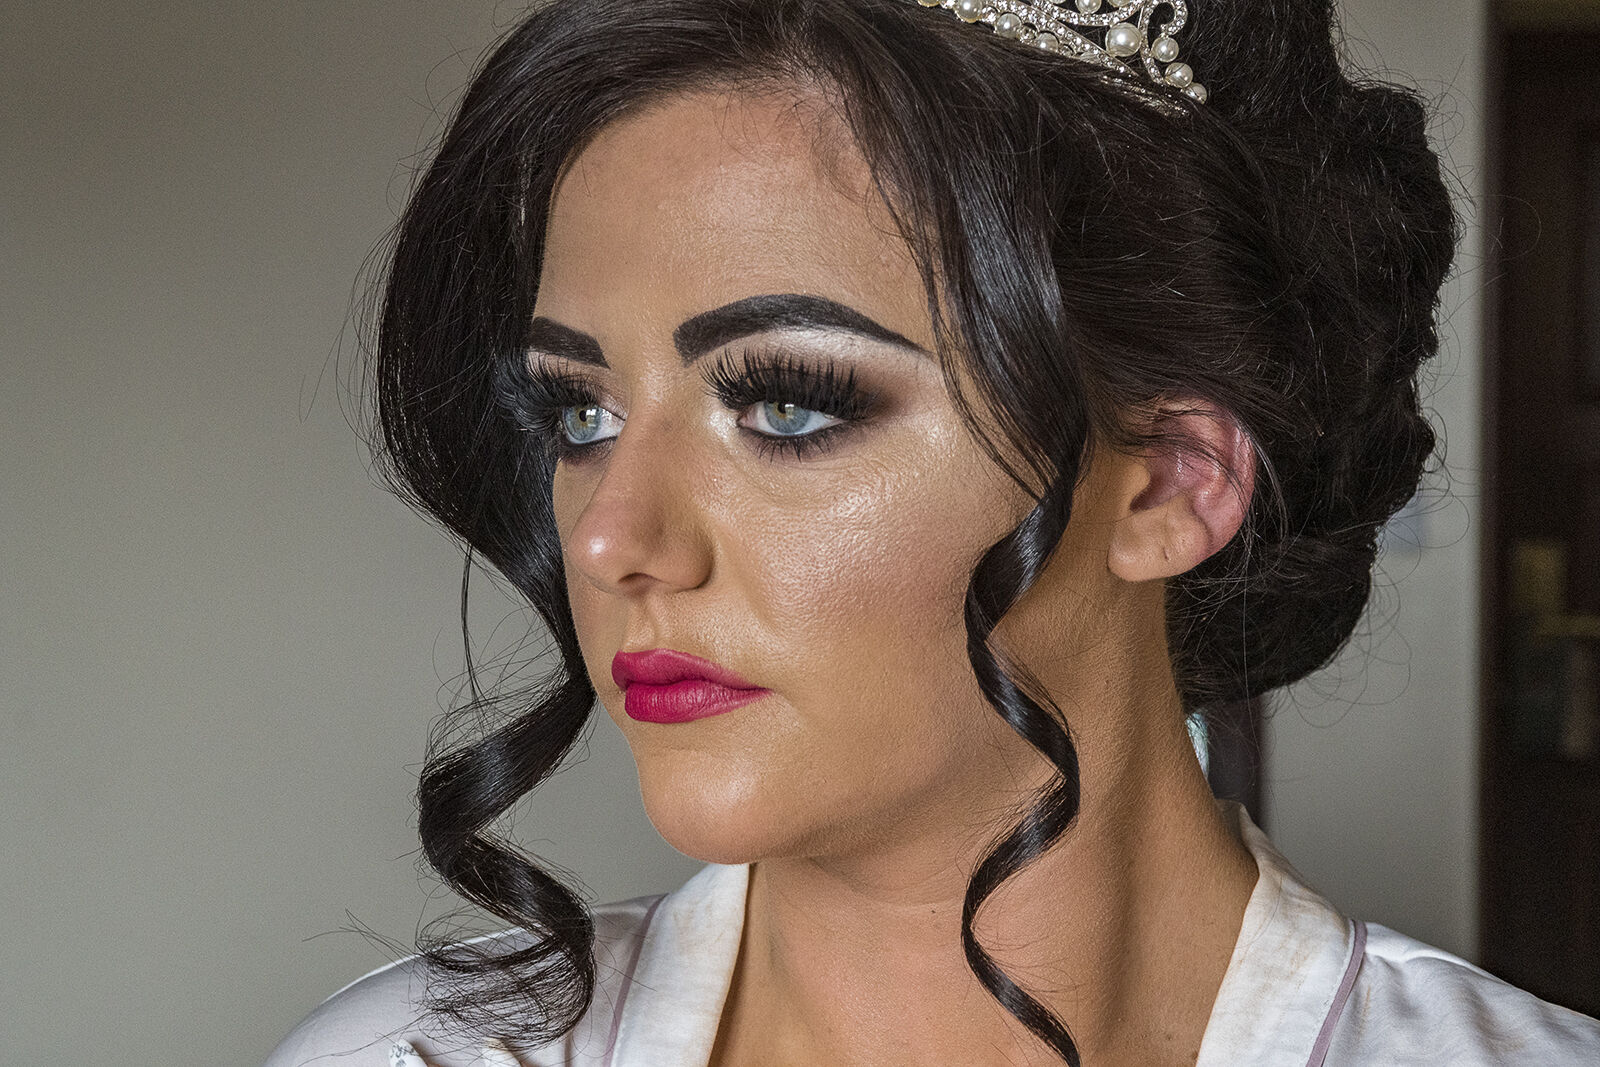 Delillah Just Before Her Wedding, Dublin, Ireland 2020